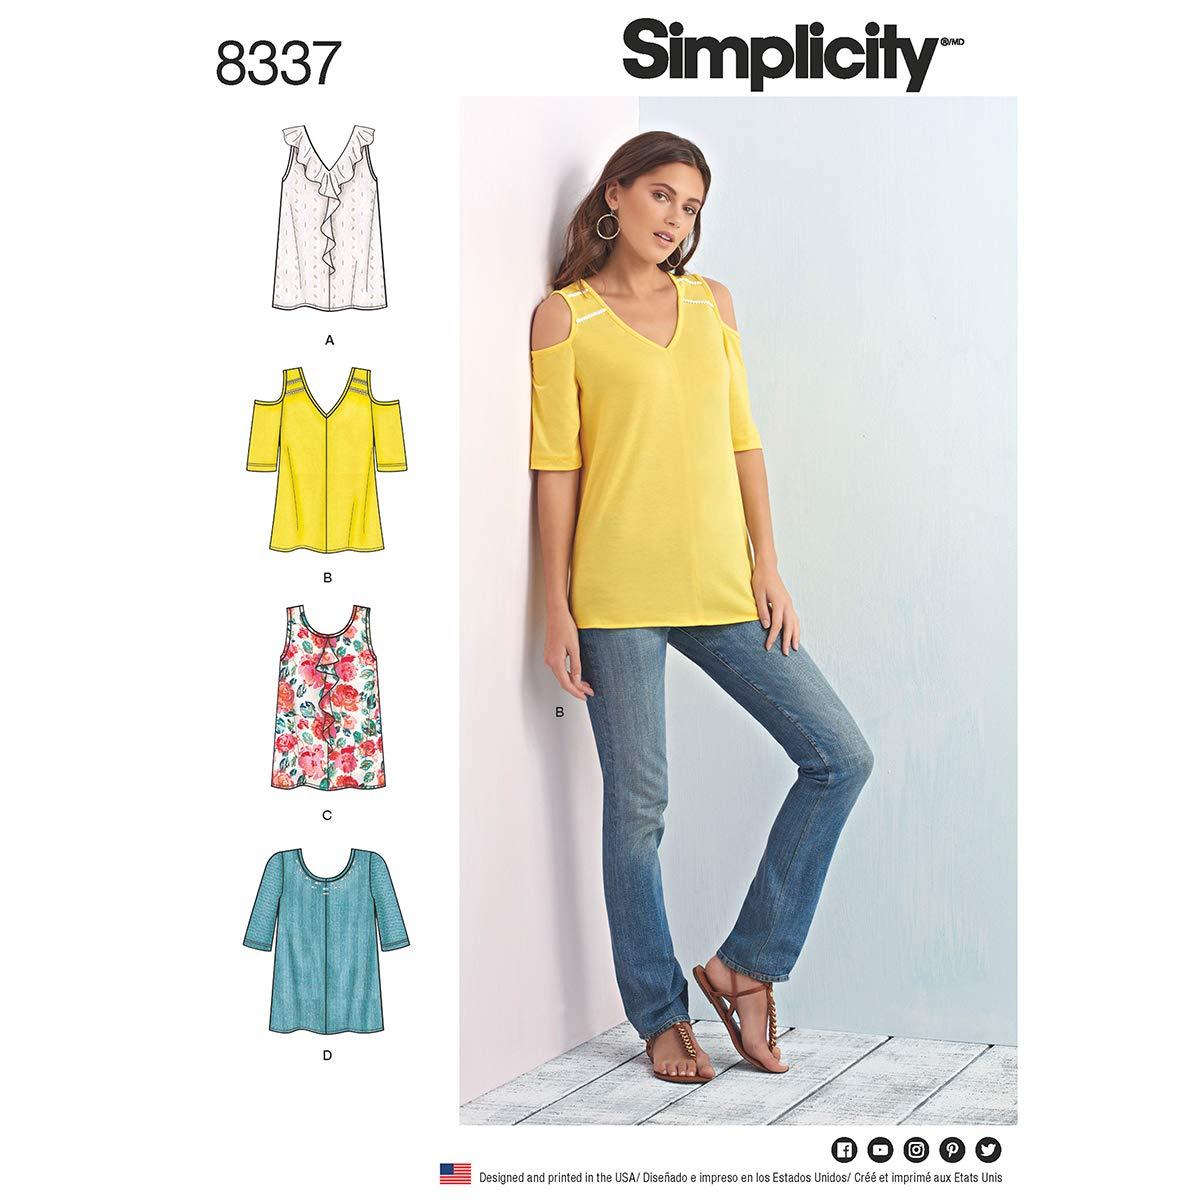 Simplicity Pattern 8337 A(XXS-XS-SML-XL-XXL)ボディスと袖のバリエーションがあるニットトップスがありません、ペーパー、ホワイト、22 x 15 x 1 cm   B06WGVRKZR